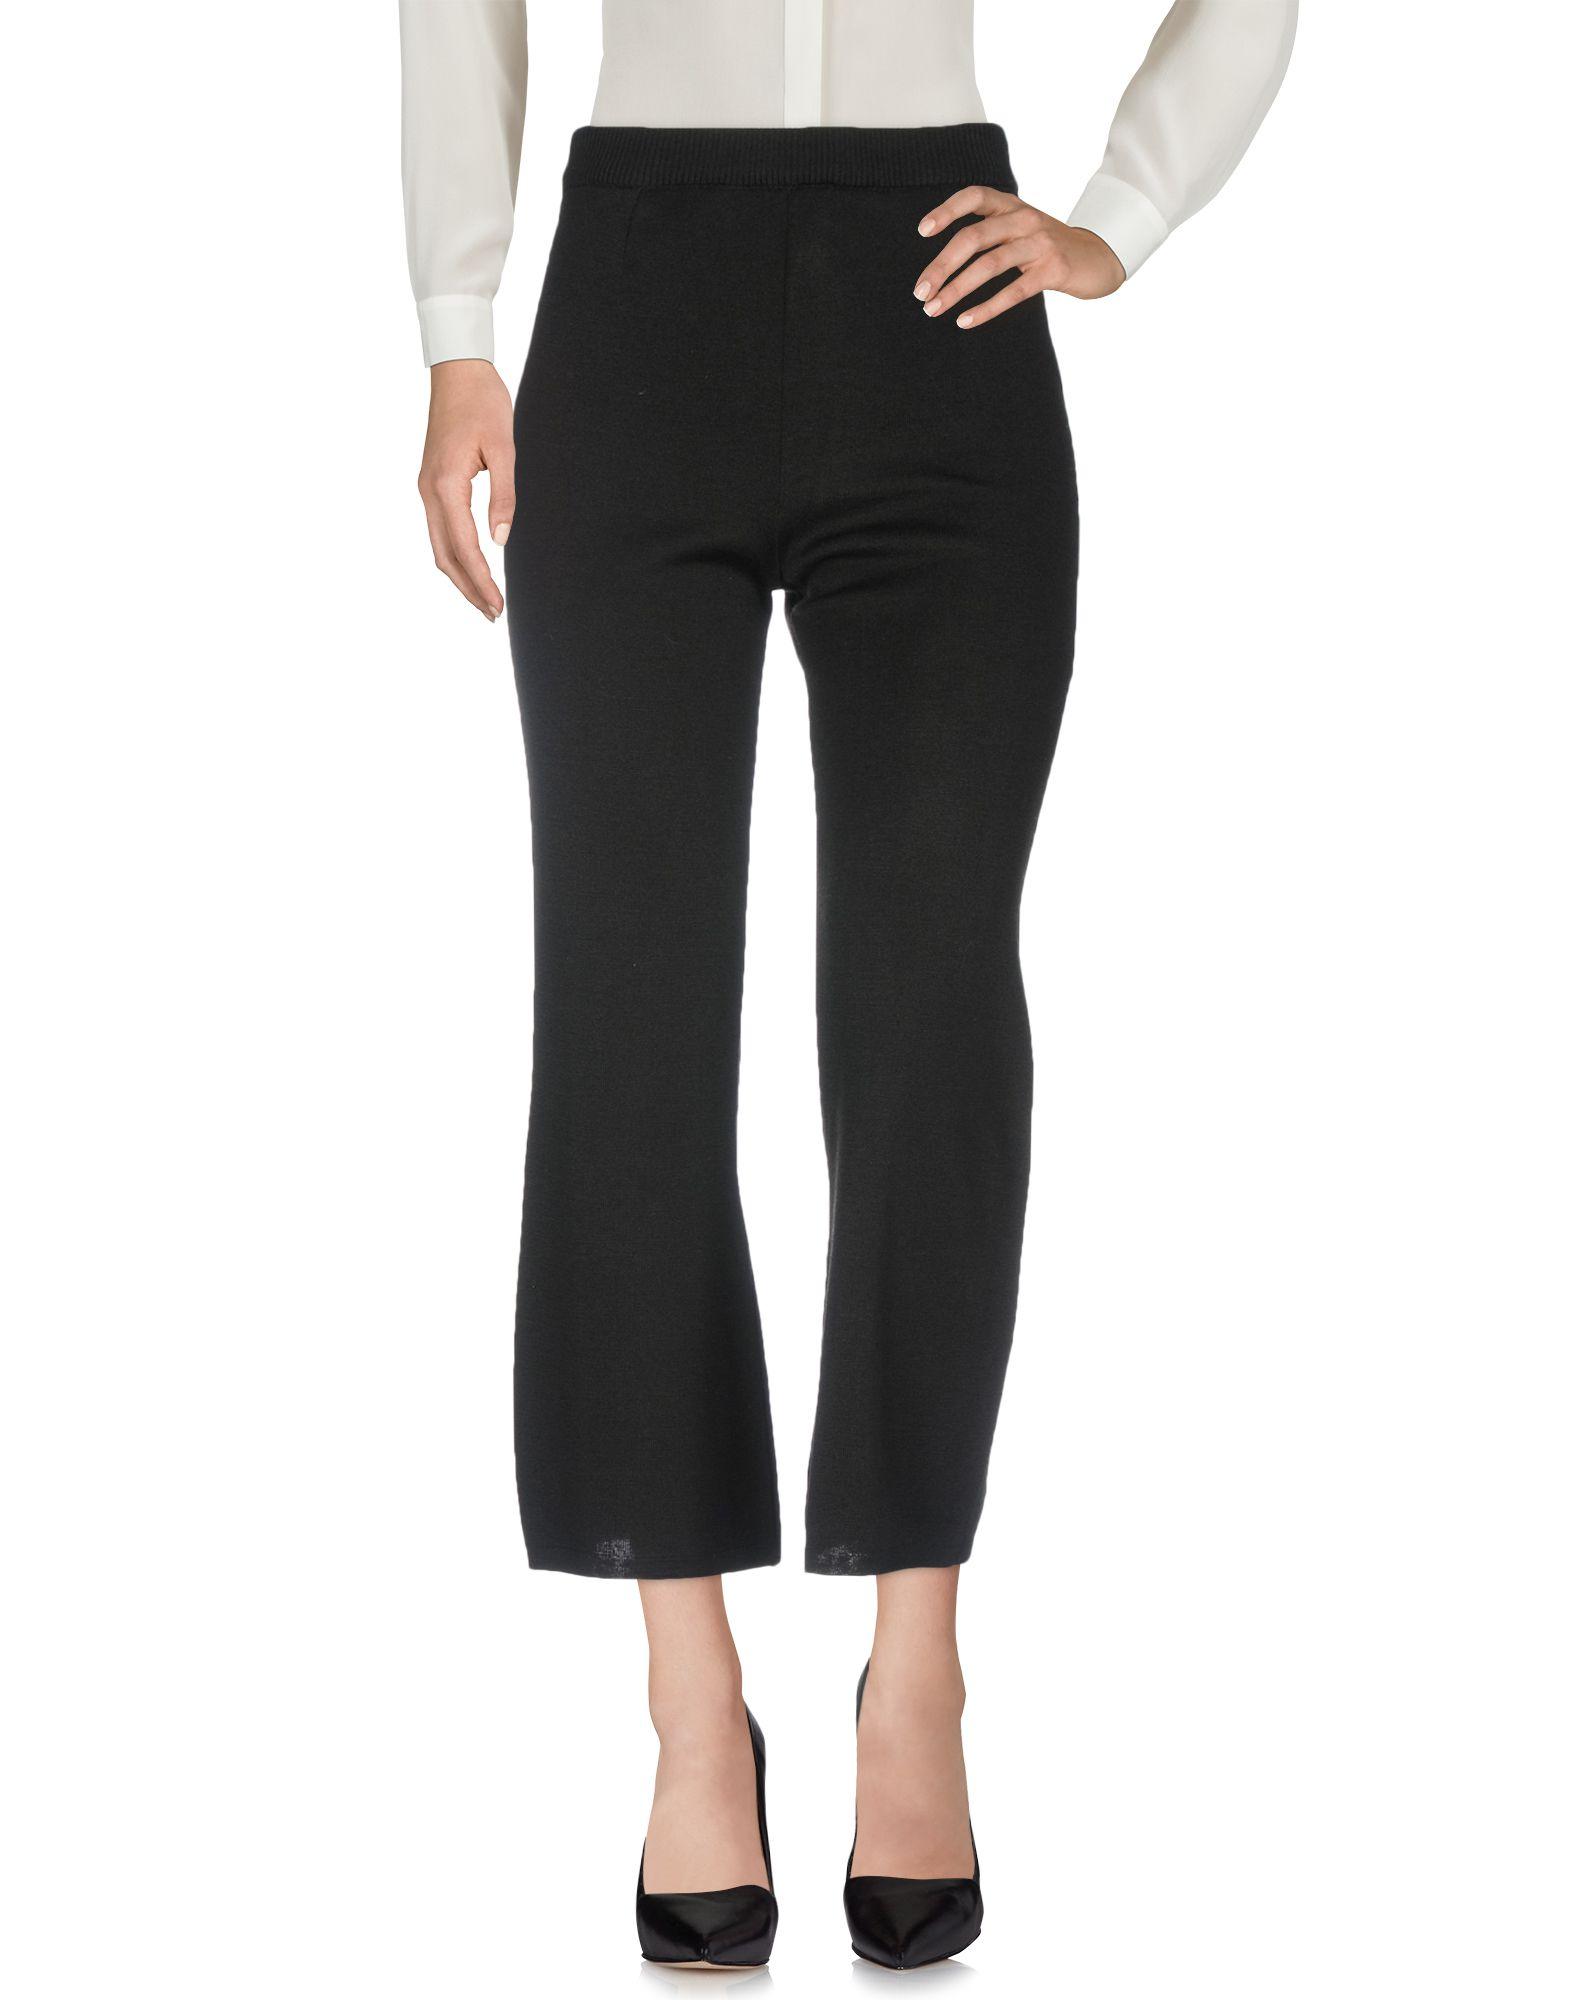 D'ENIA Casual Pants in Black